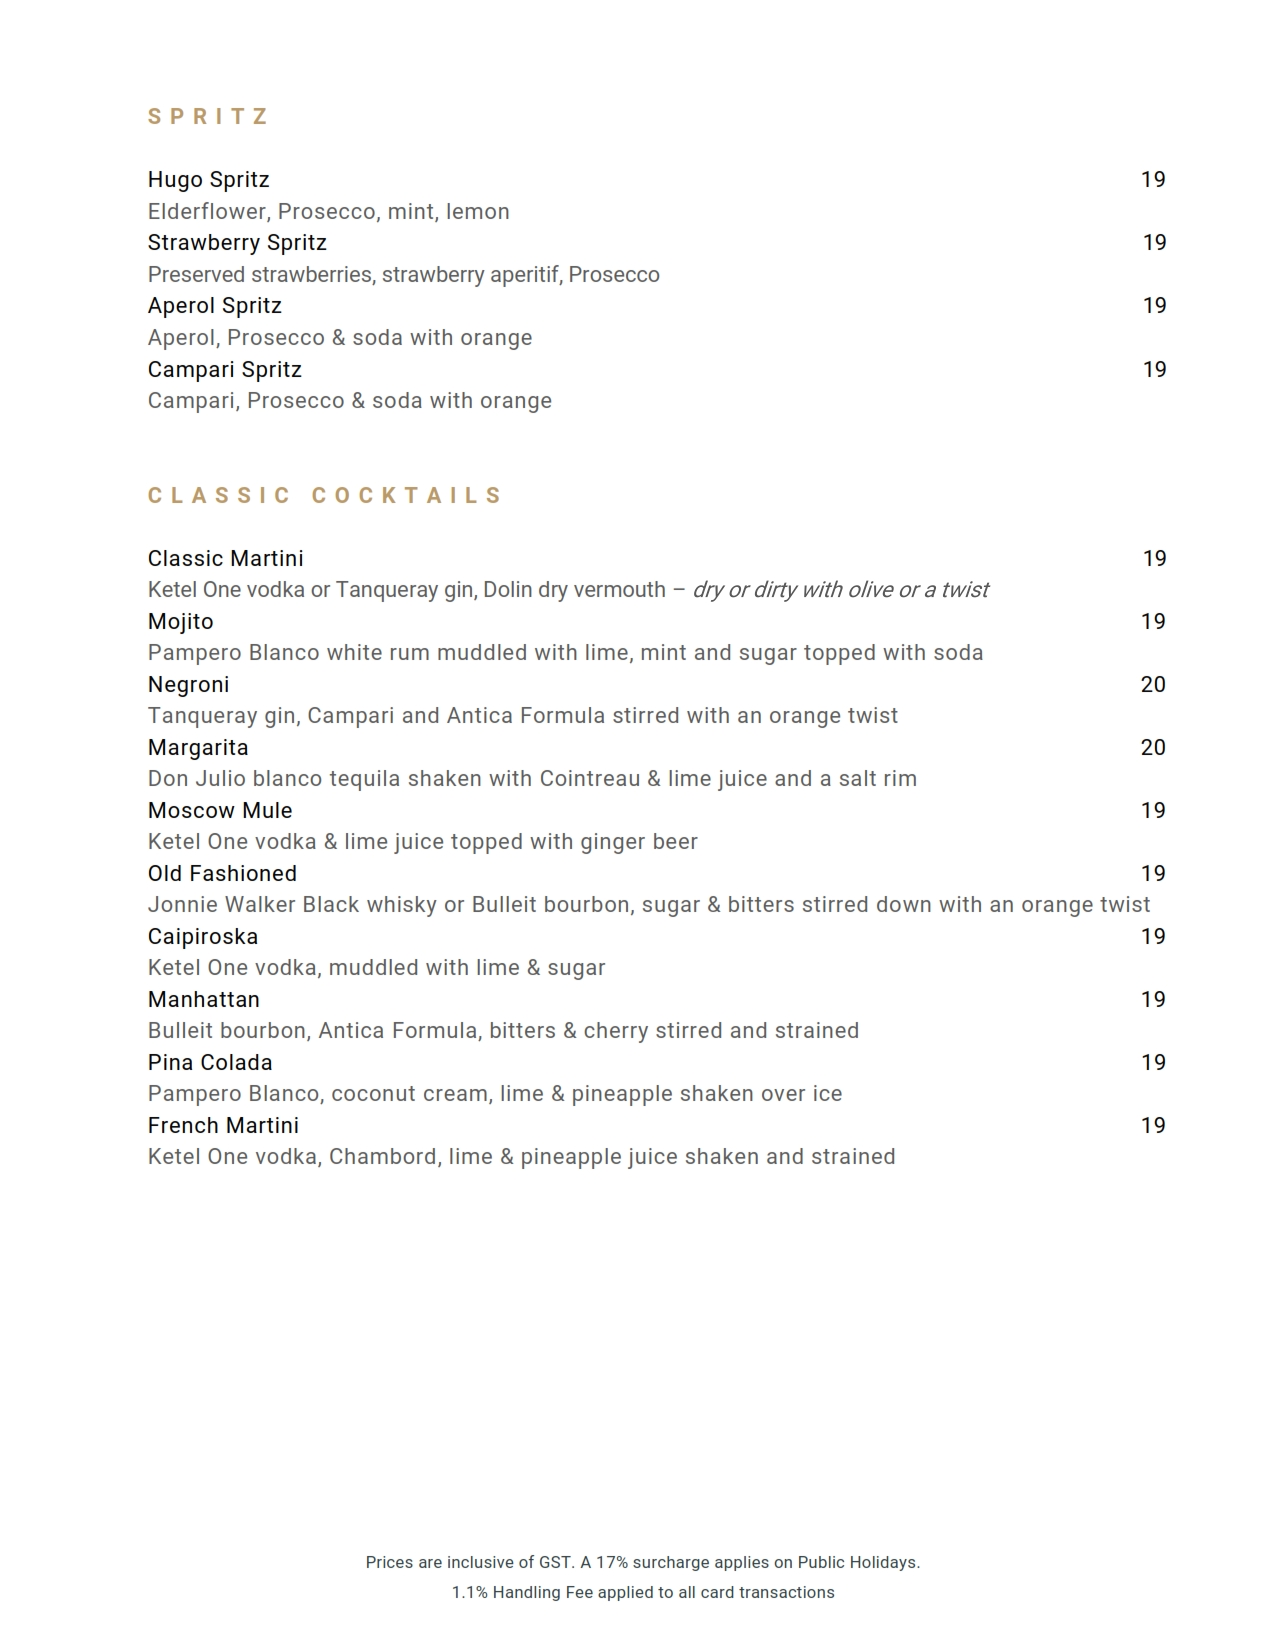 2019 11 15 Cocktail List03